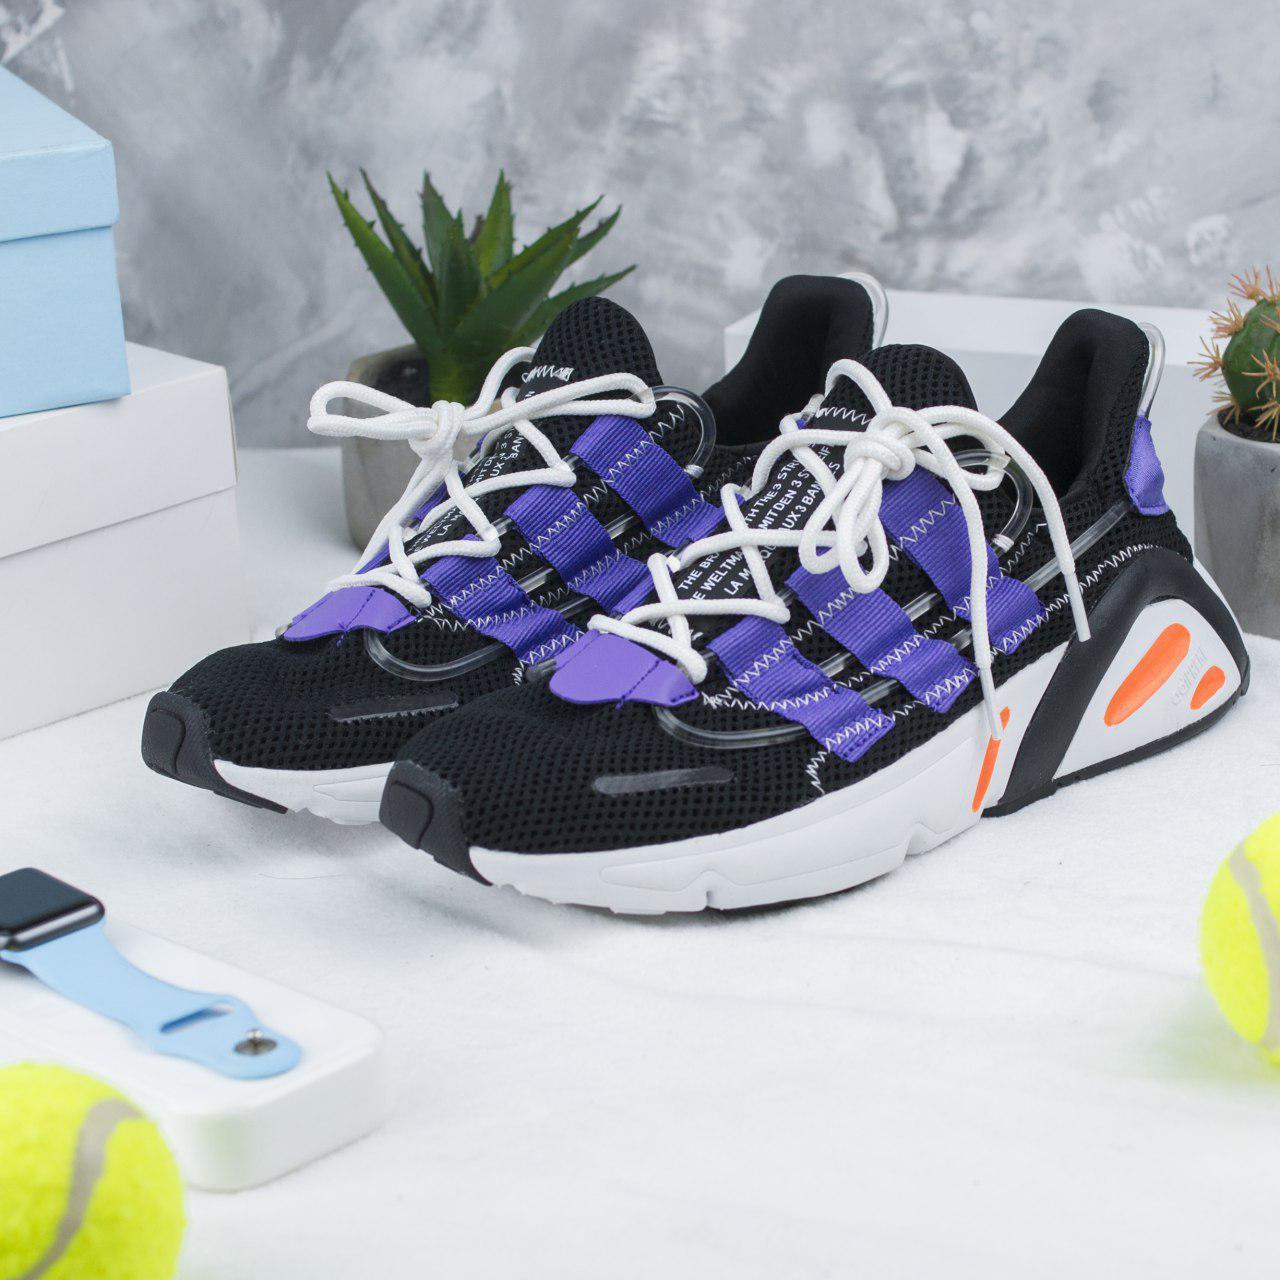 online store 5325b 5a21a Мужские кроссовки в стиле Adidas Yeezy Boost 600 Black/White/Blue